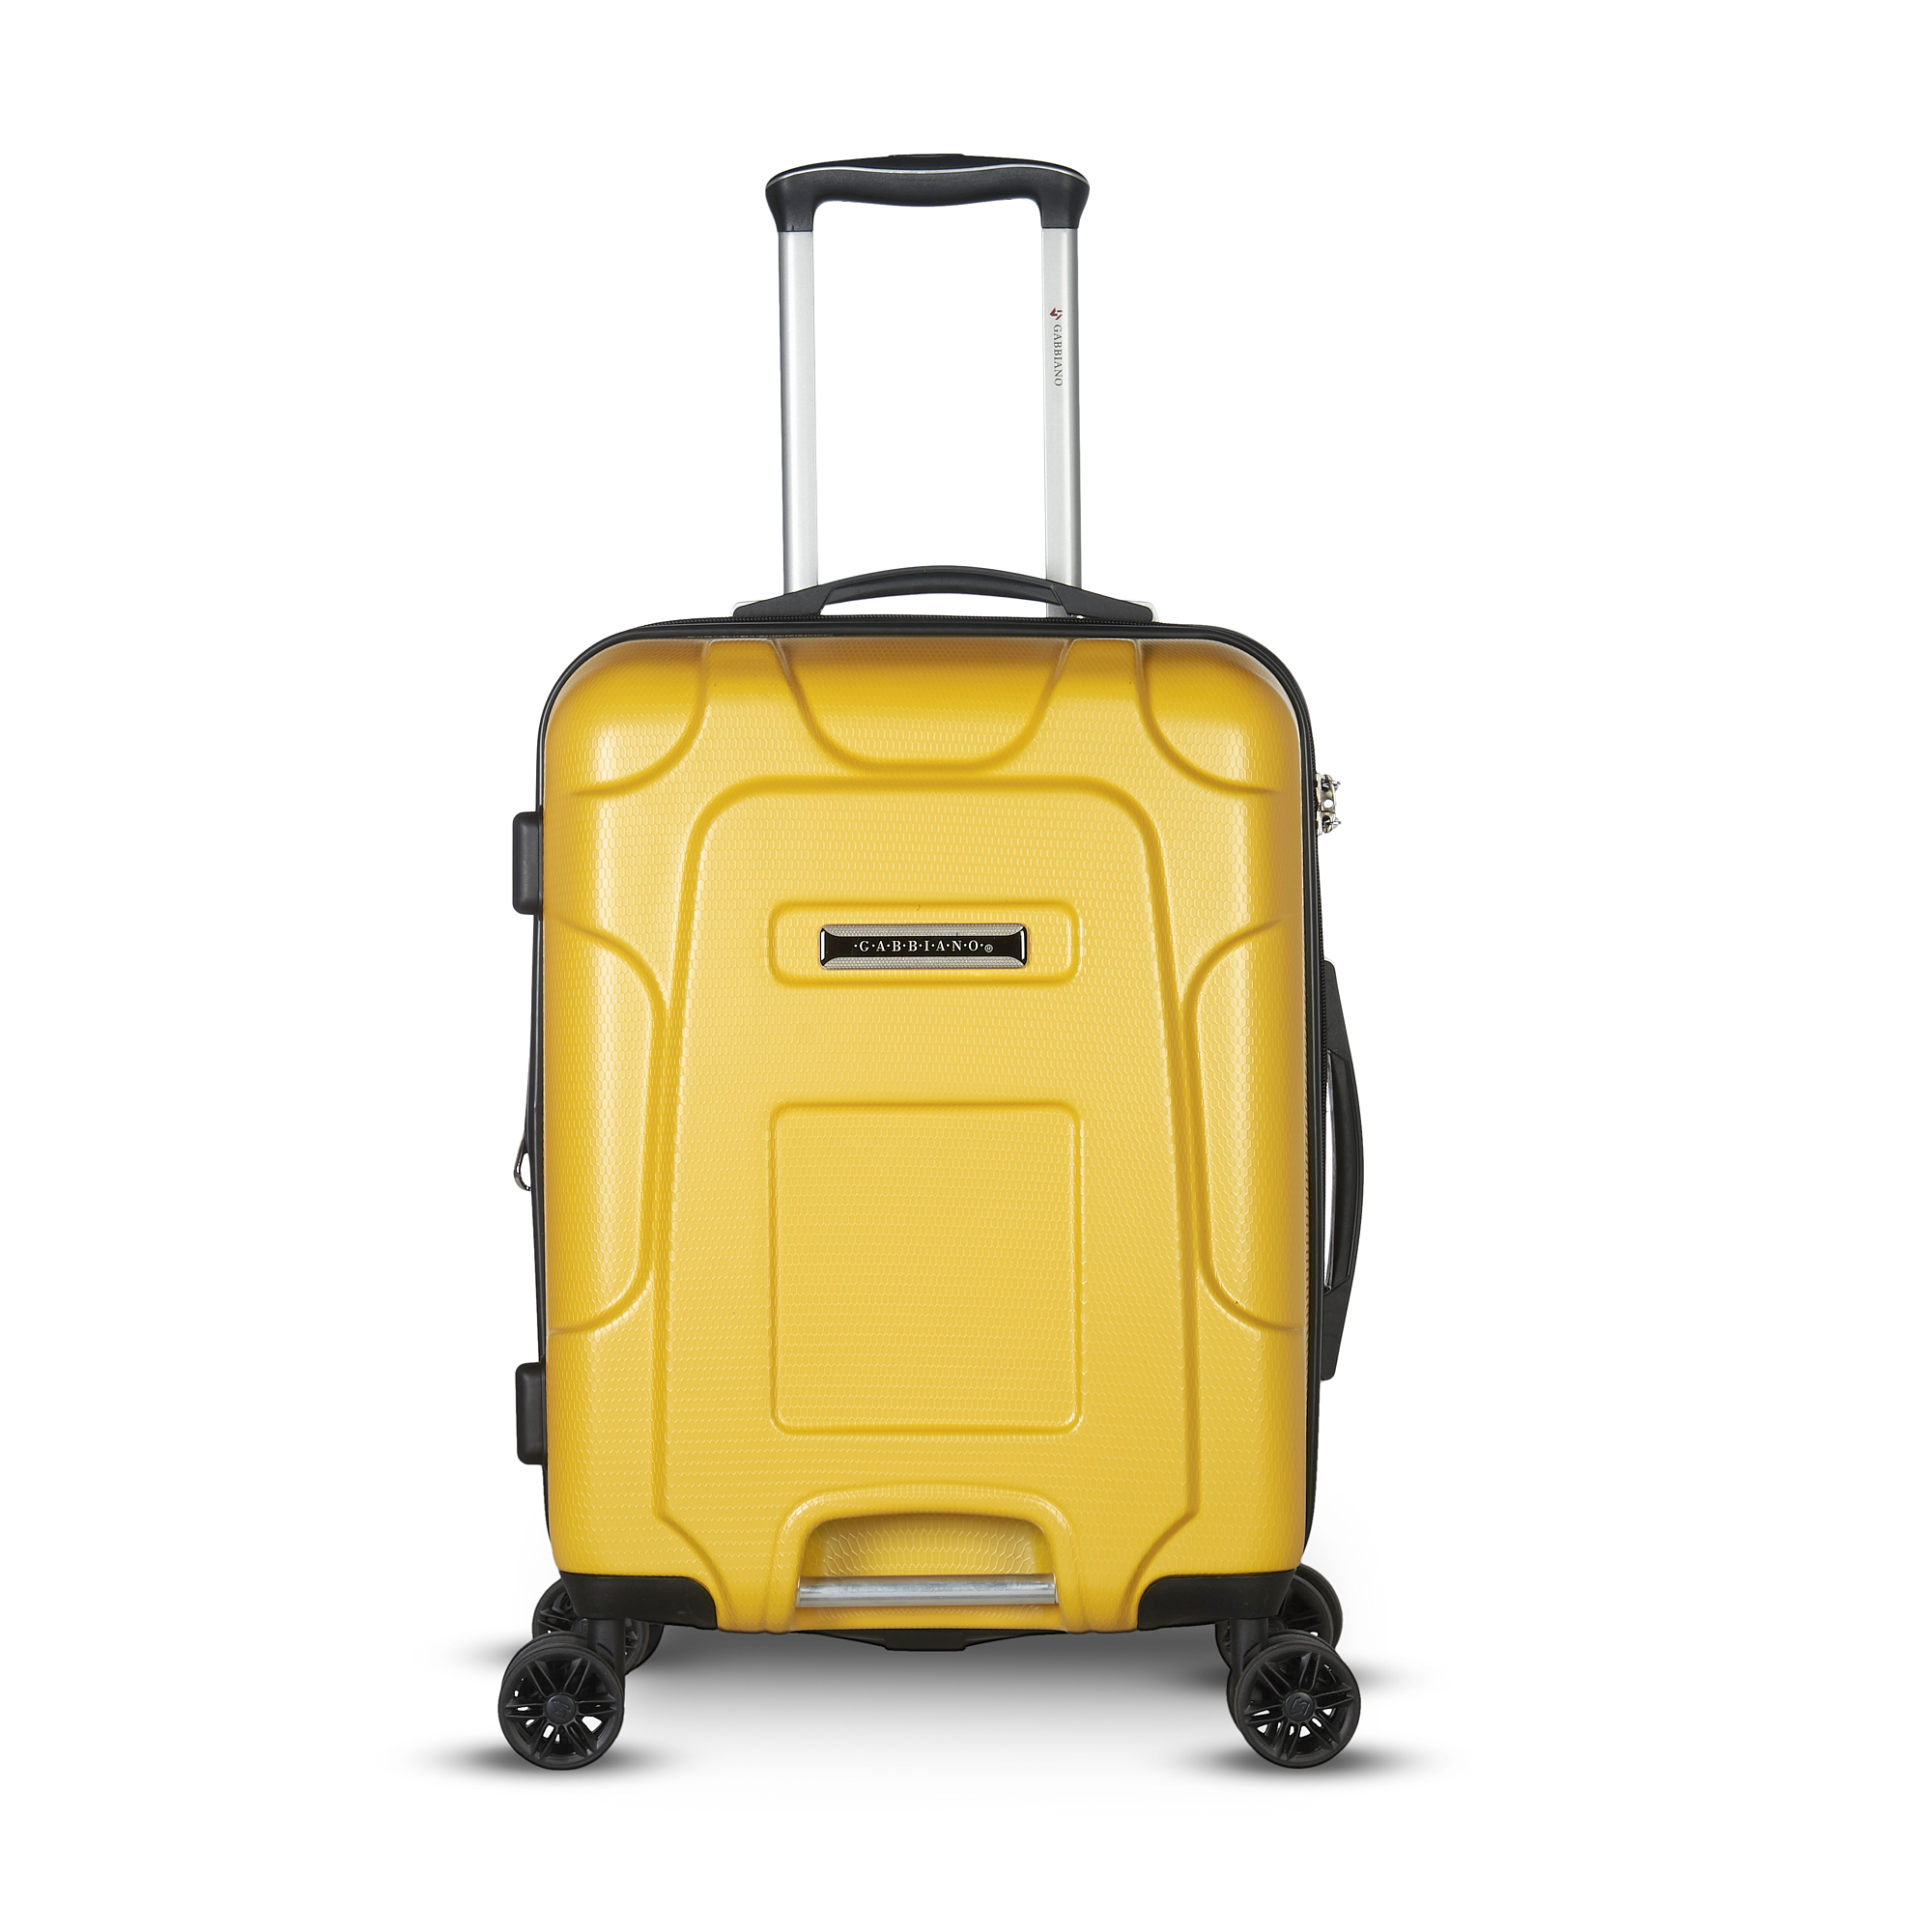 LG_GA2170_Yellow_FRONT